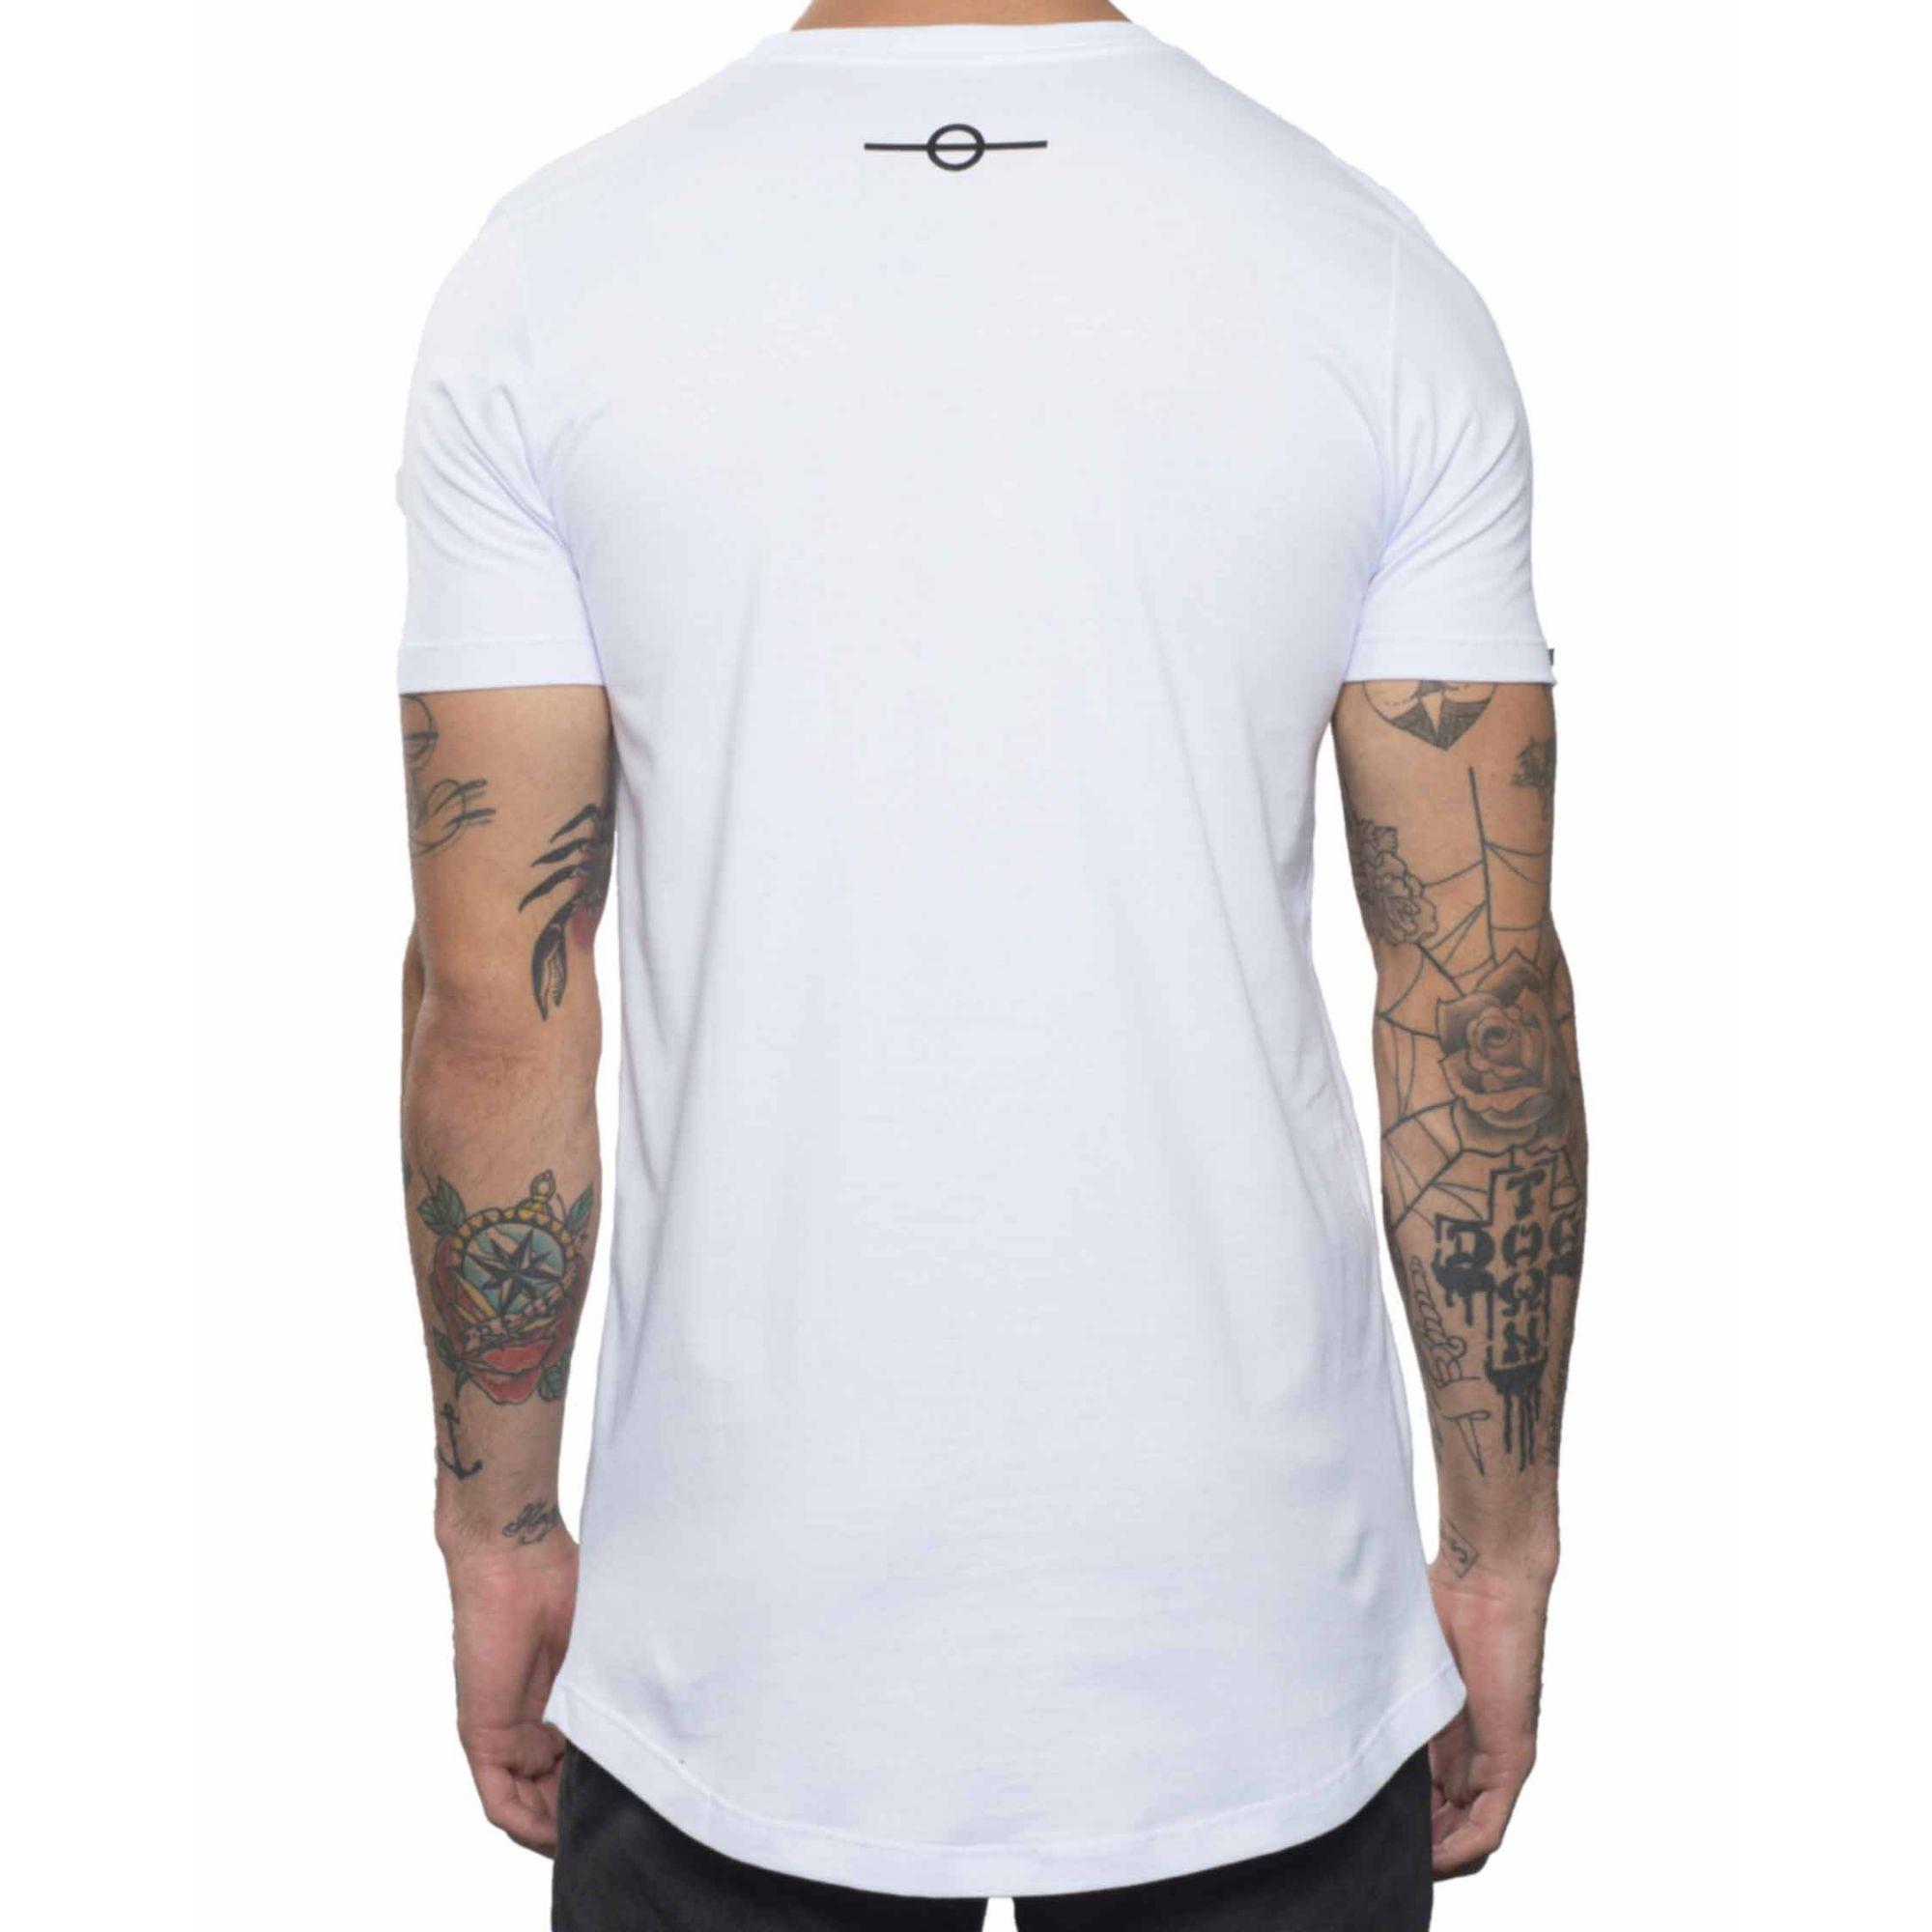 Camiseta Buh Joueur White